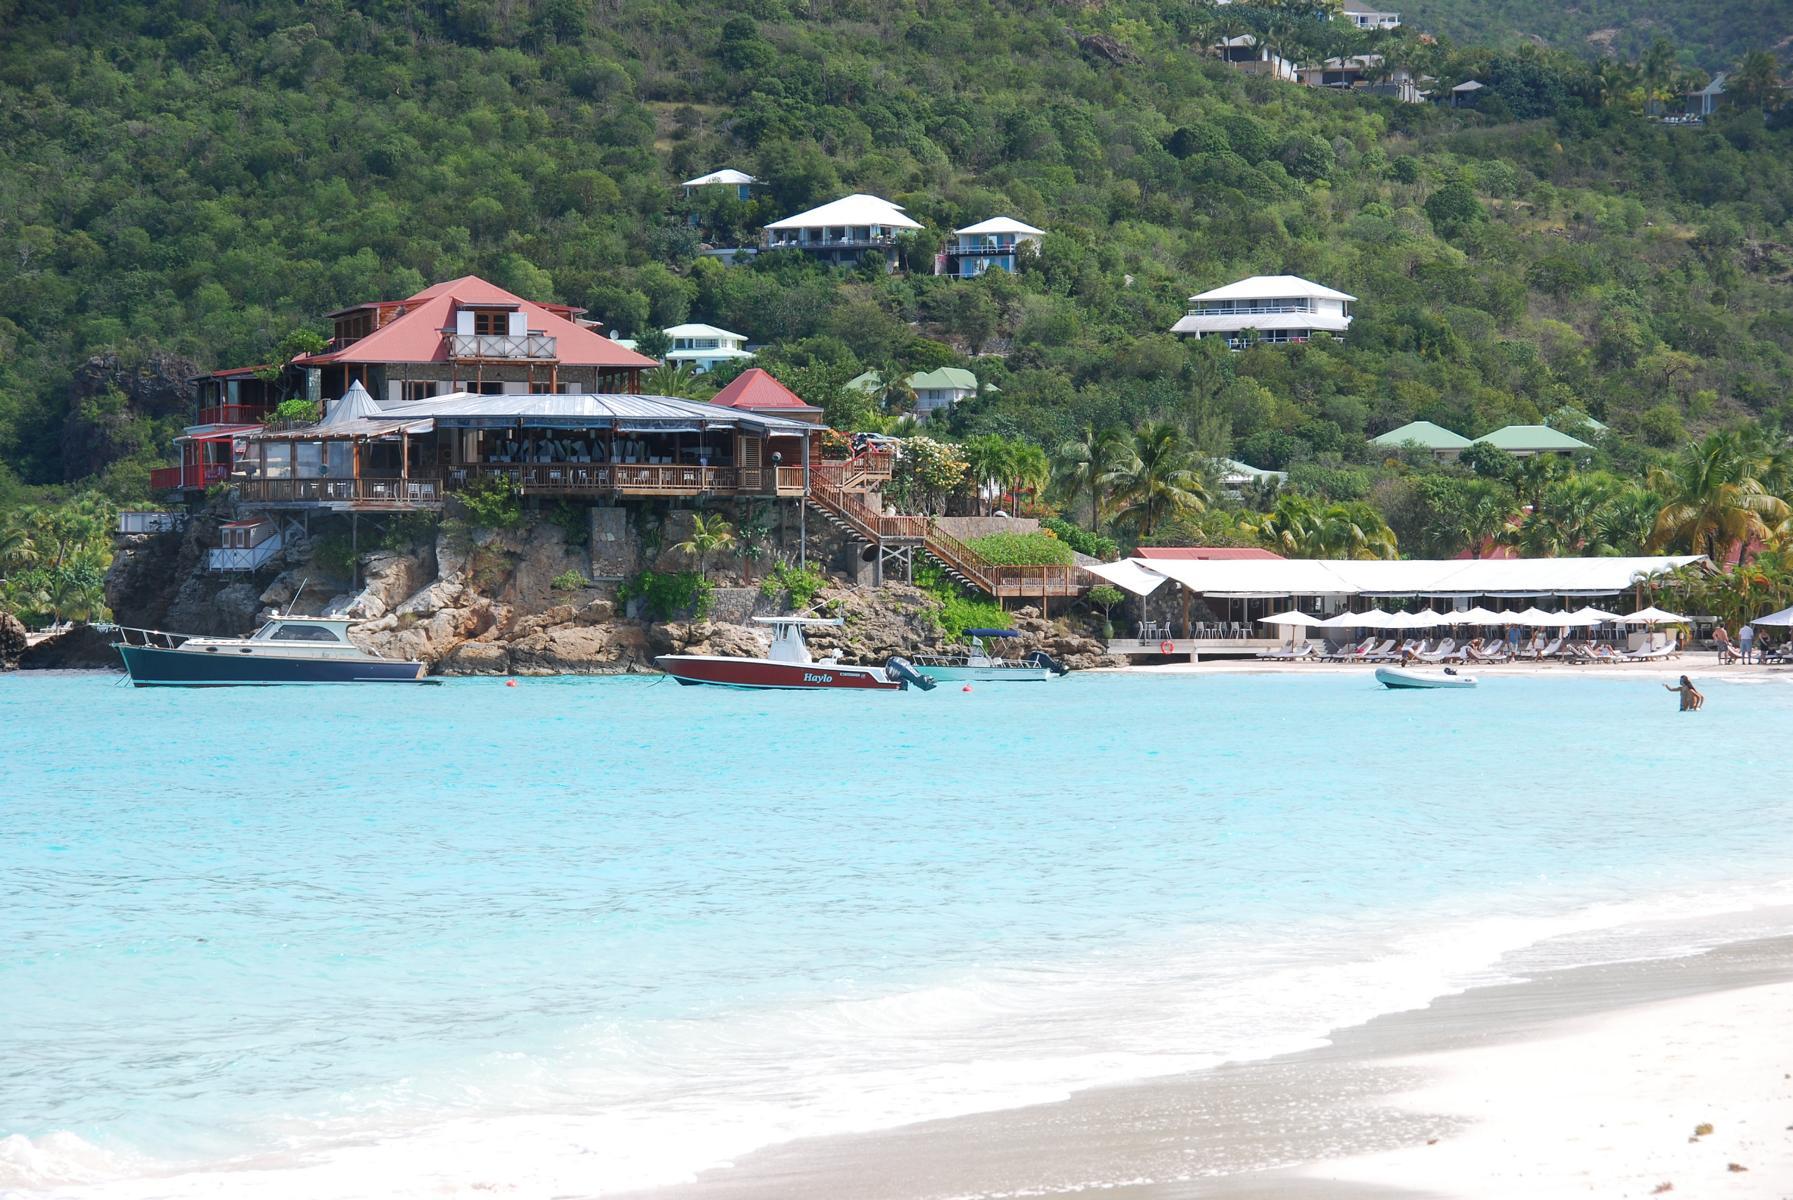 0 St. Barth Nikki Beach Eden Rock Hotel Karibik Kreuzfahrt